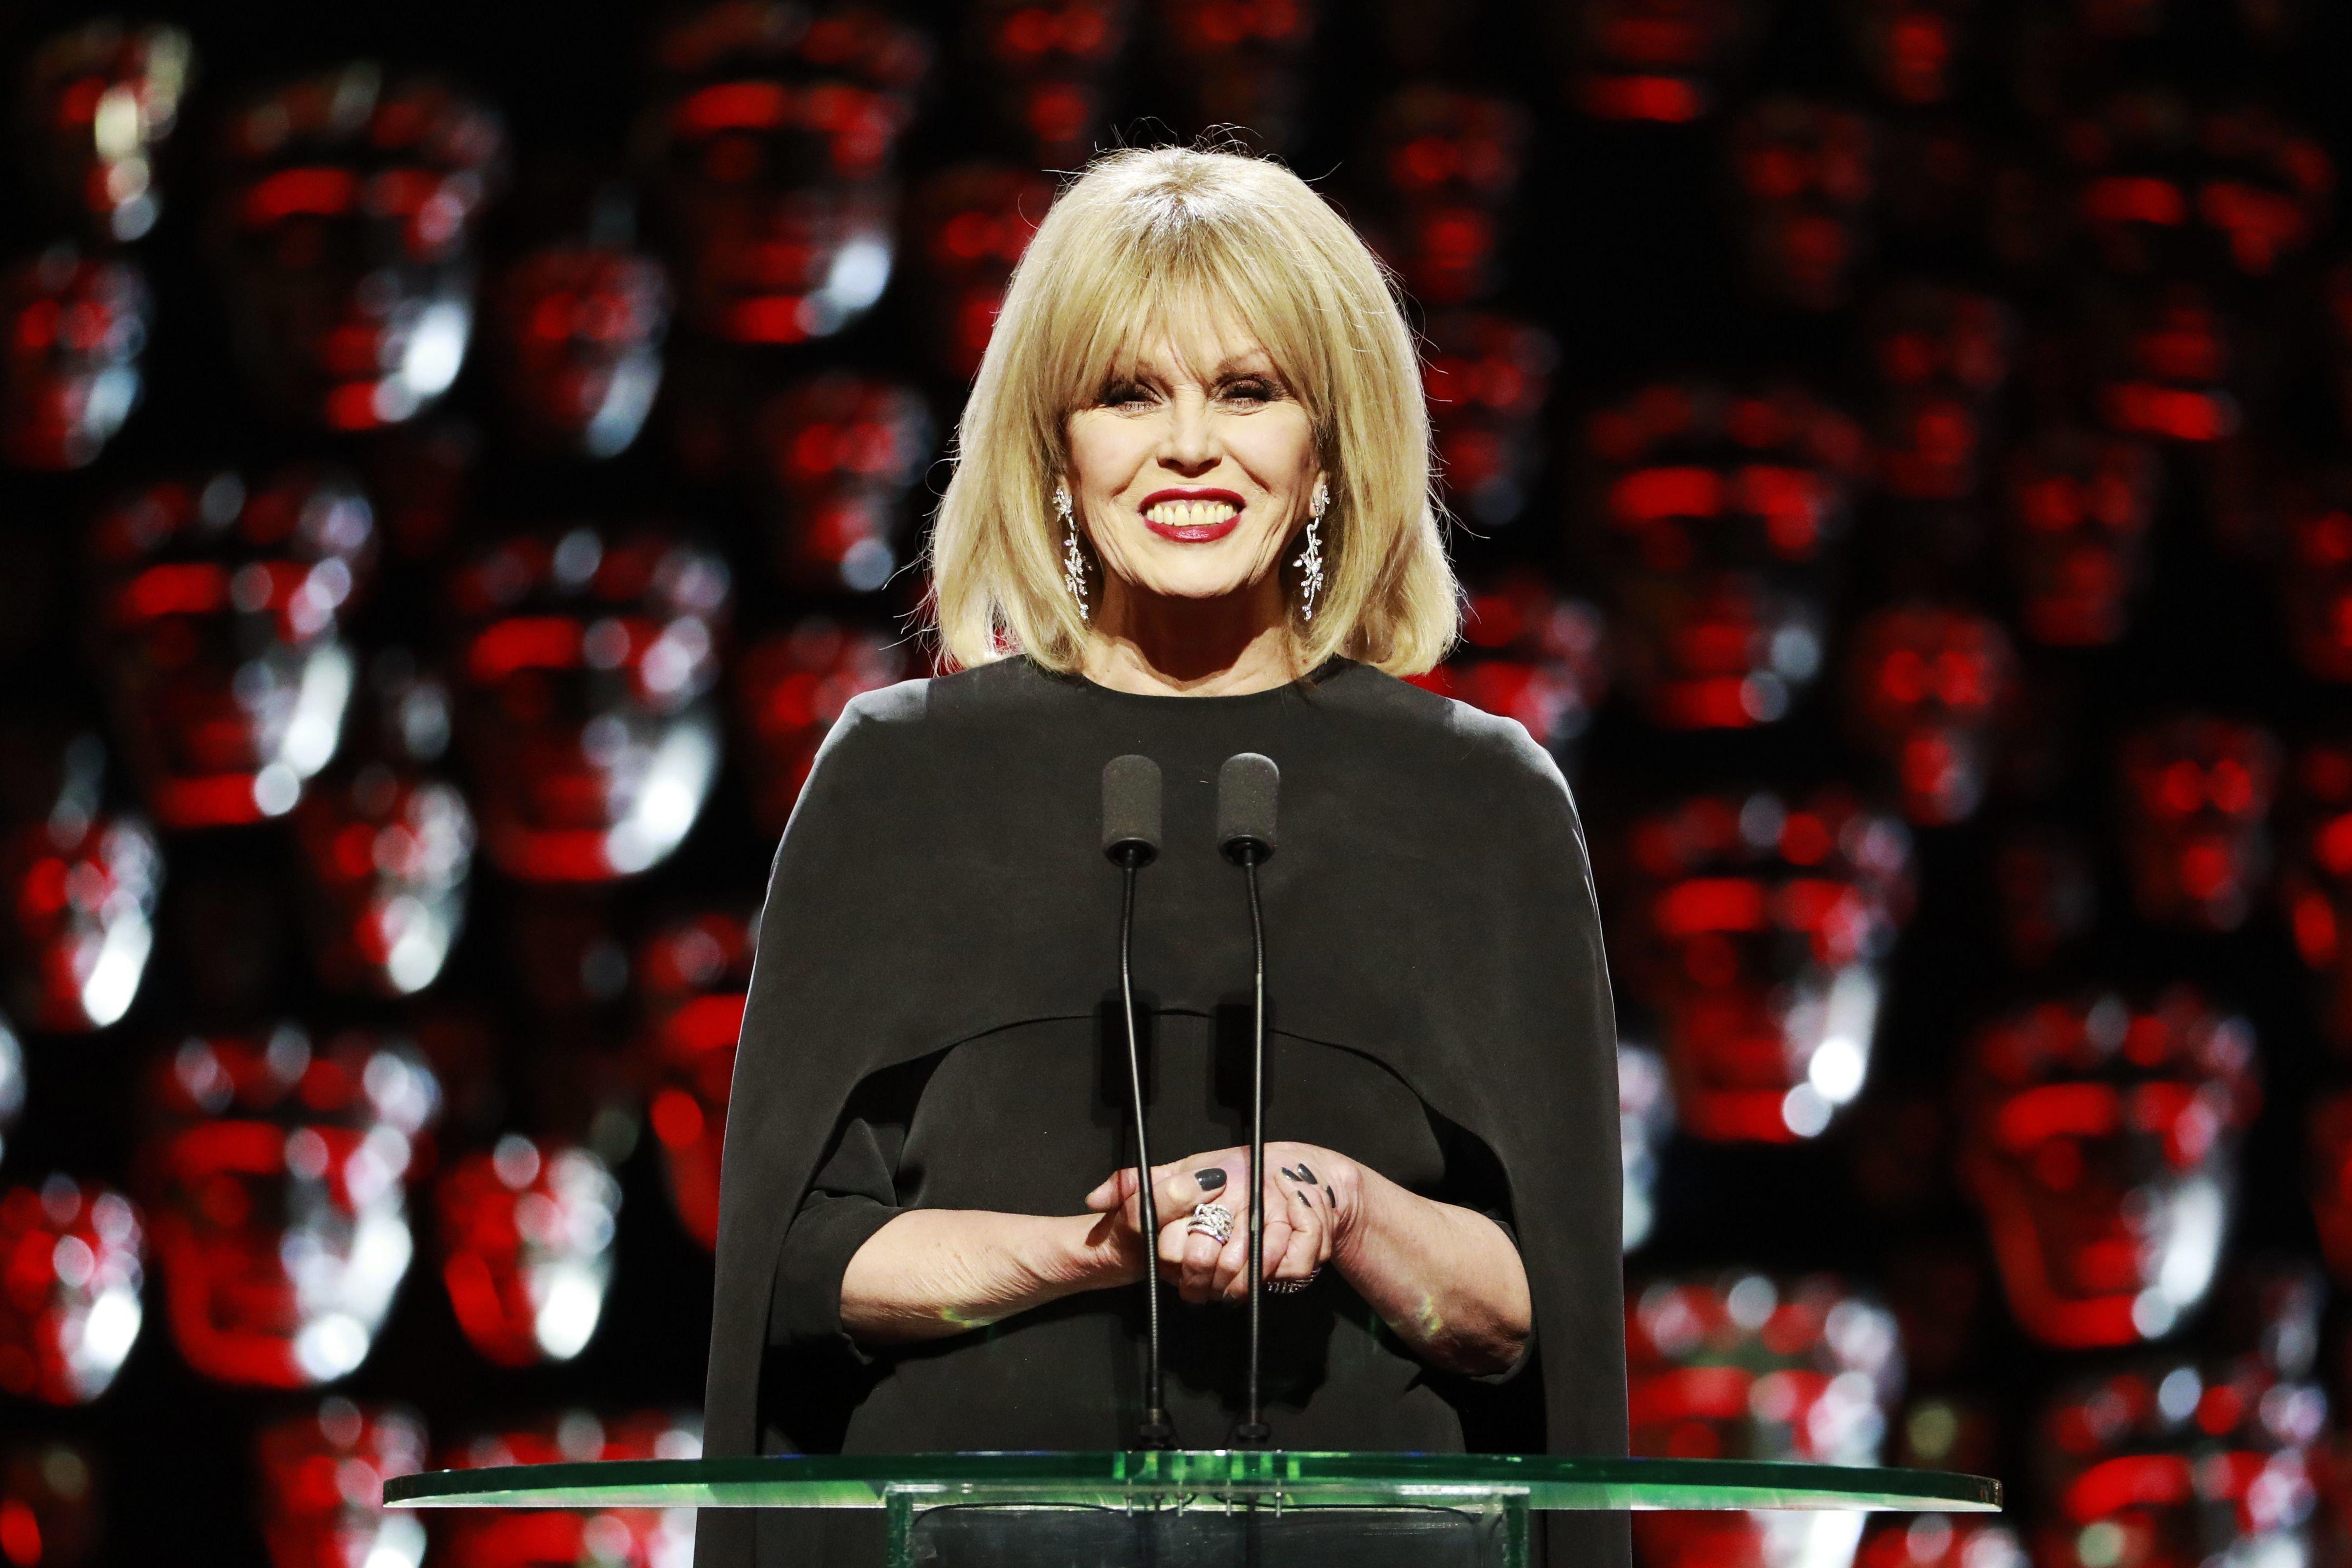 Baftas 2018: Joanna Lumley's Hosting Debut Receives Mixed Reviews